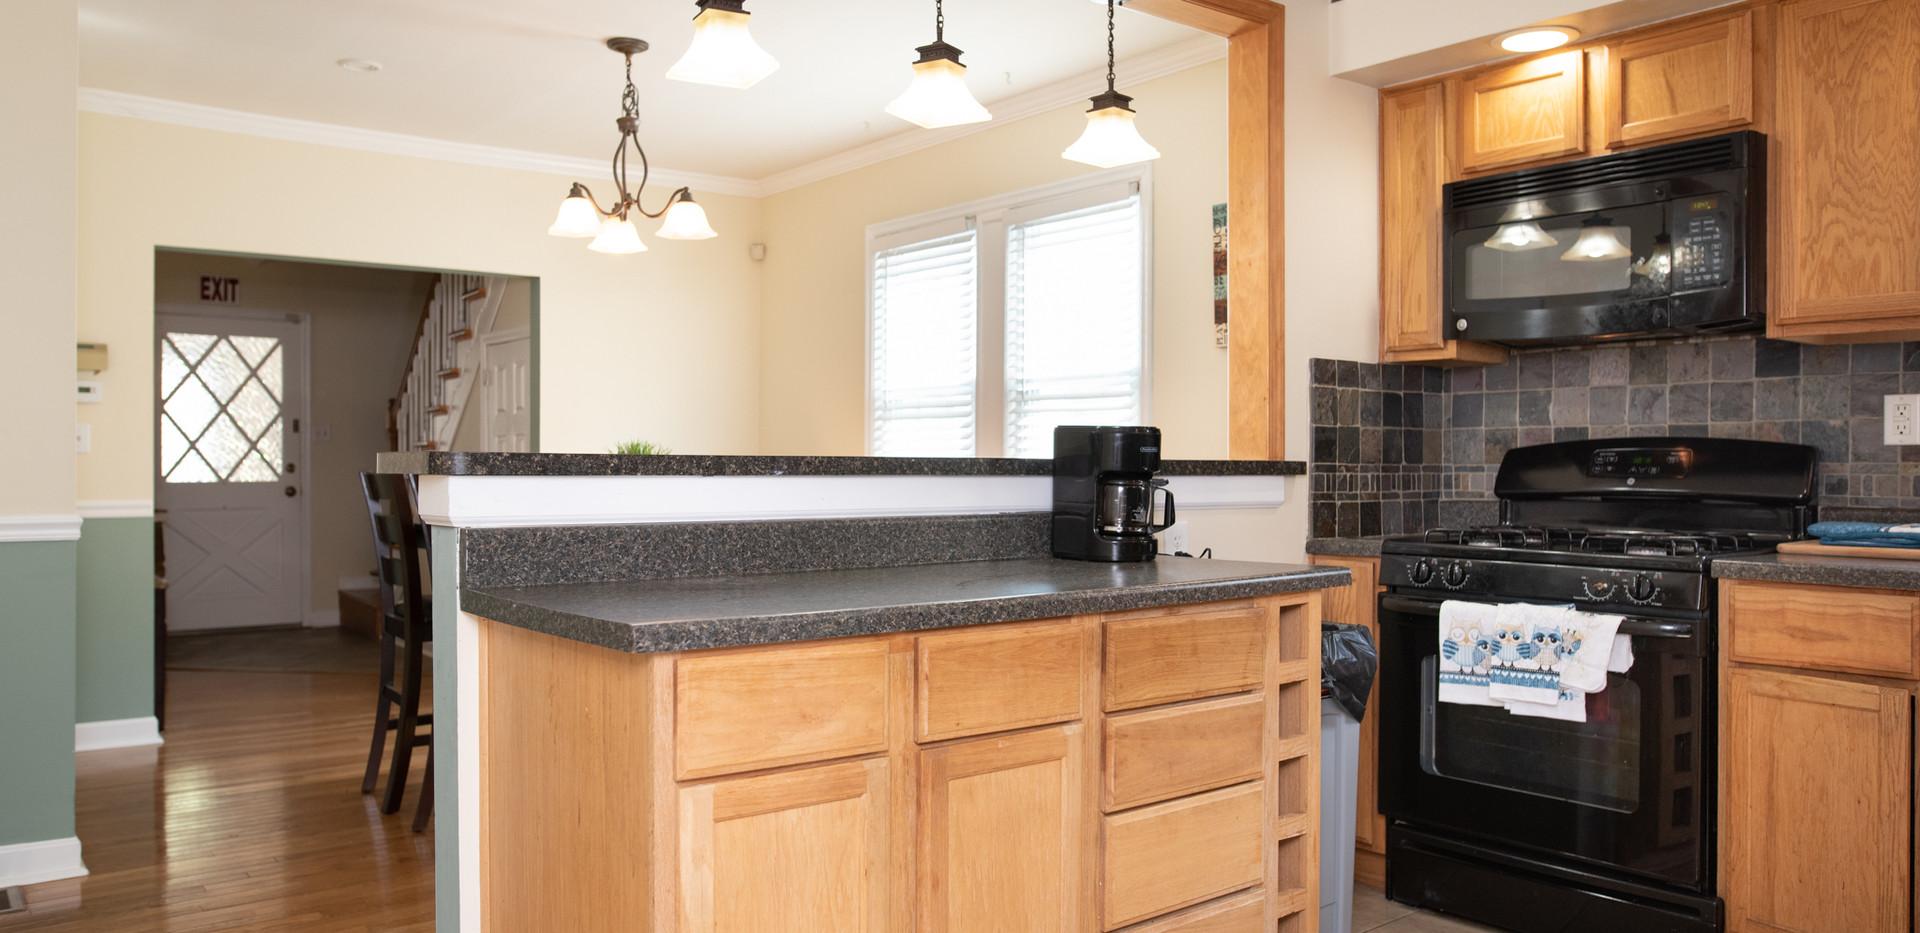 Woodbury Sober Living Kitchen